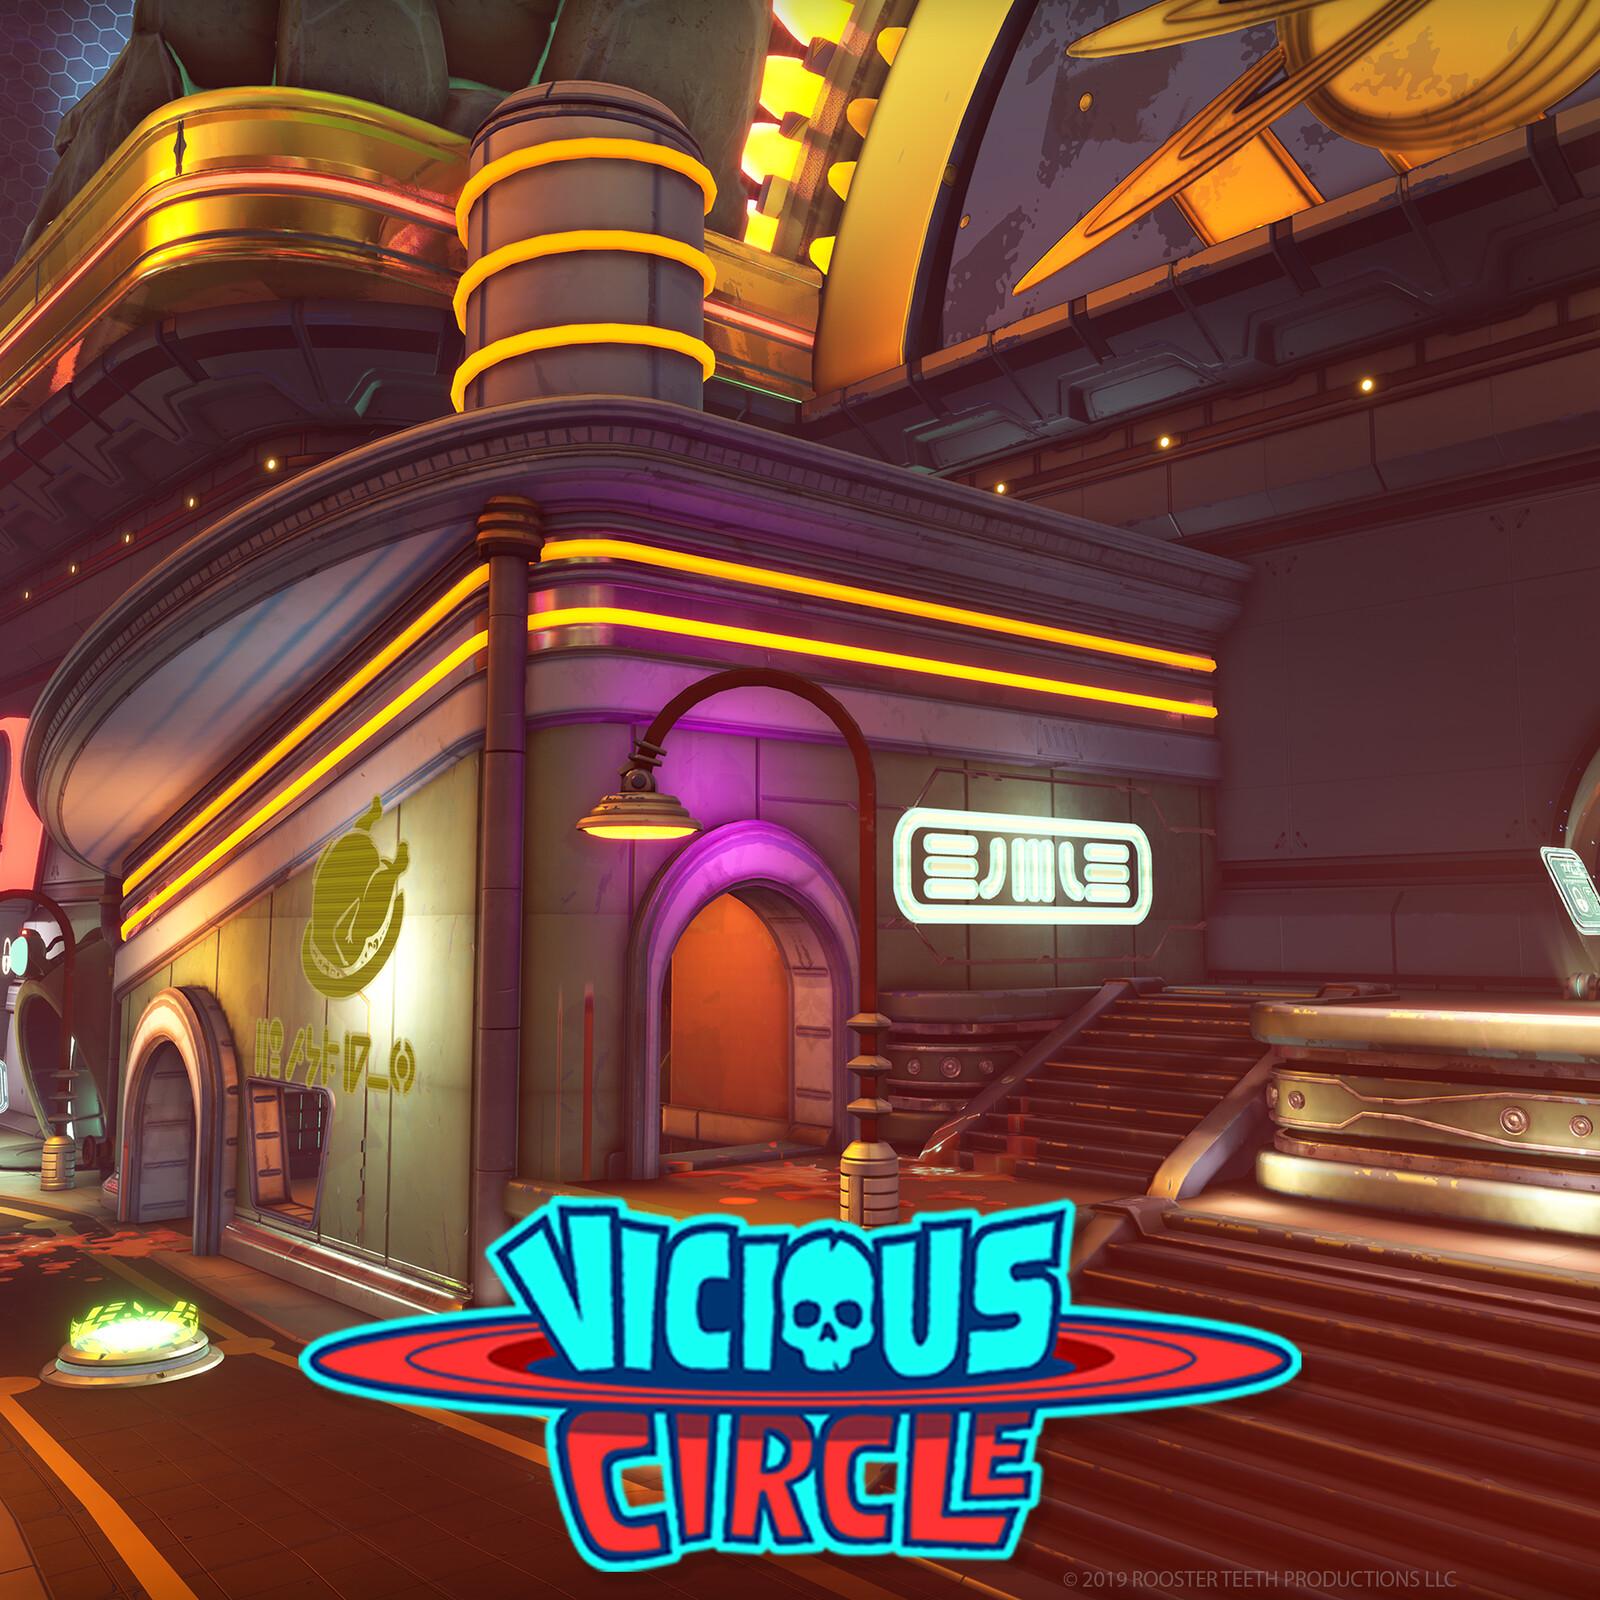 Vicious Circle - Biggie's Kitchen